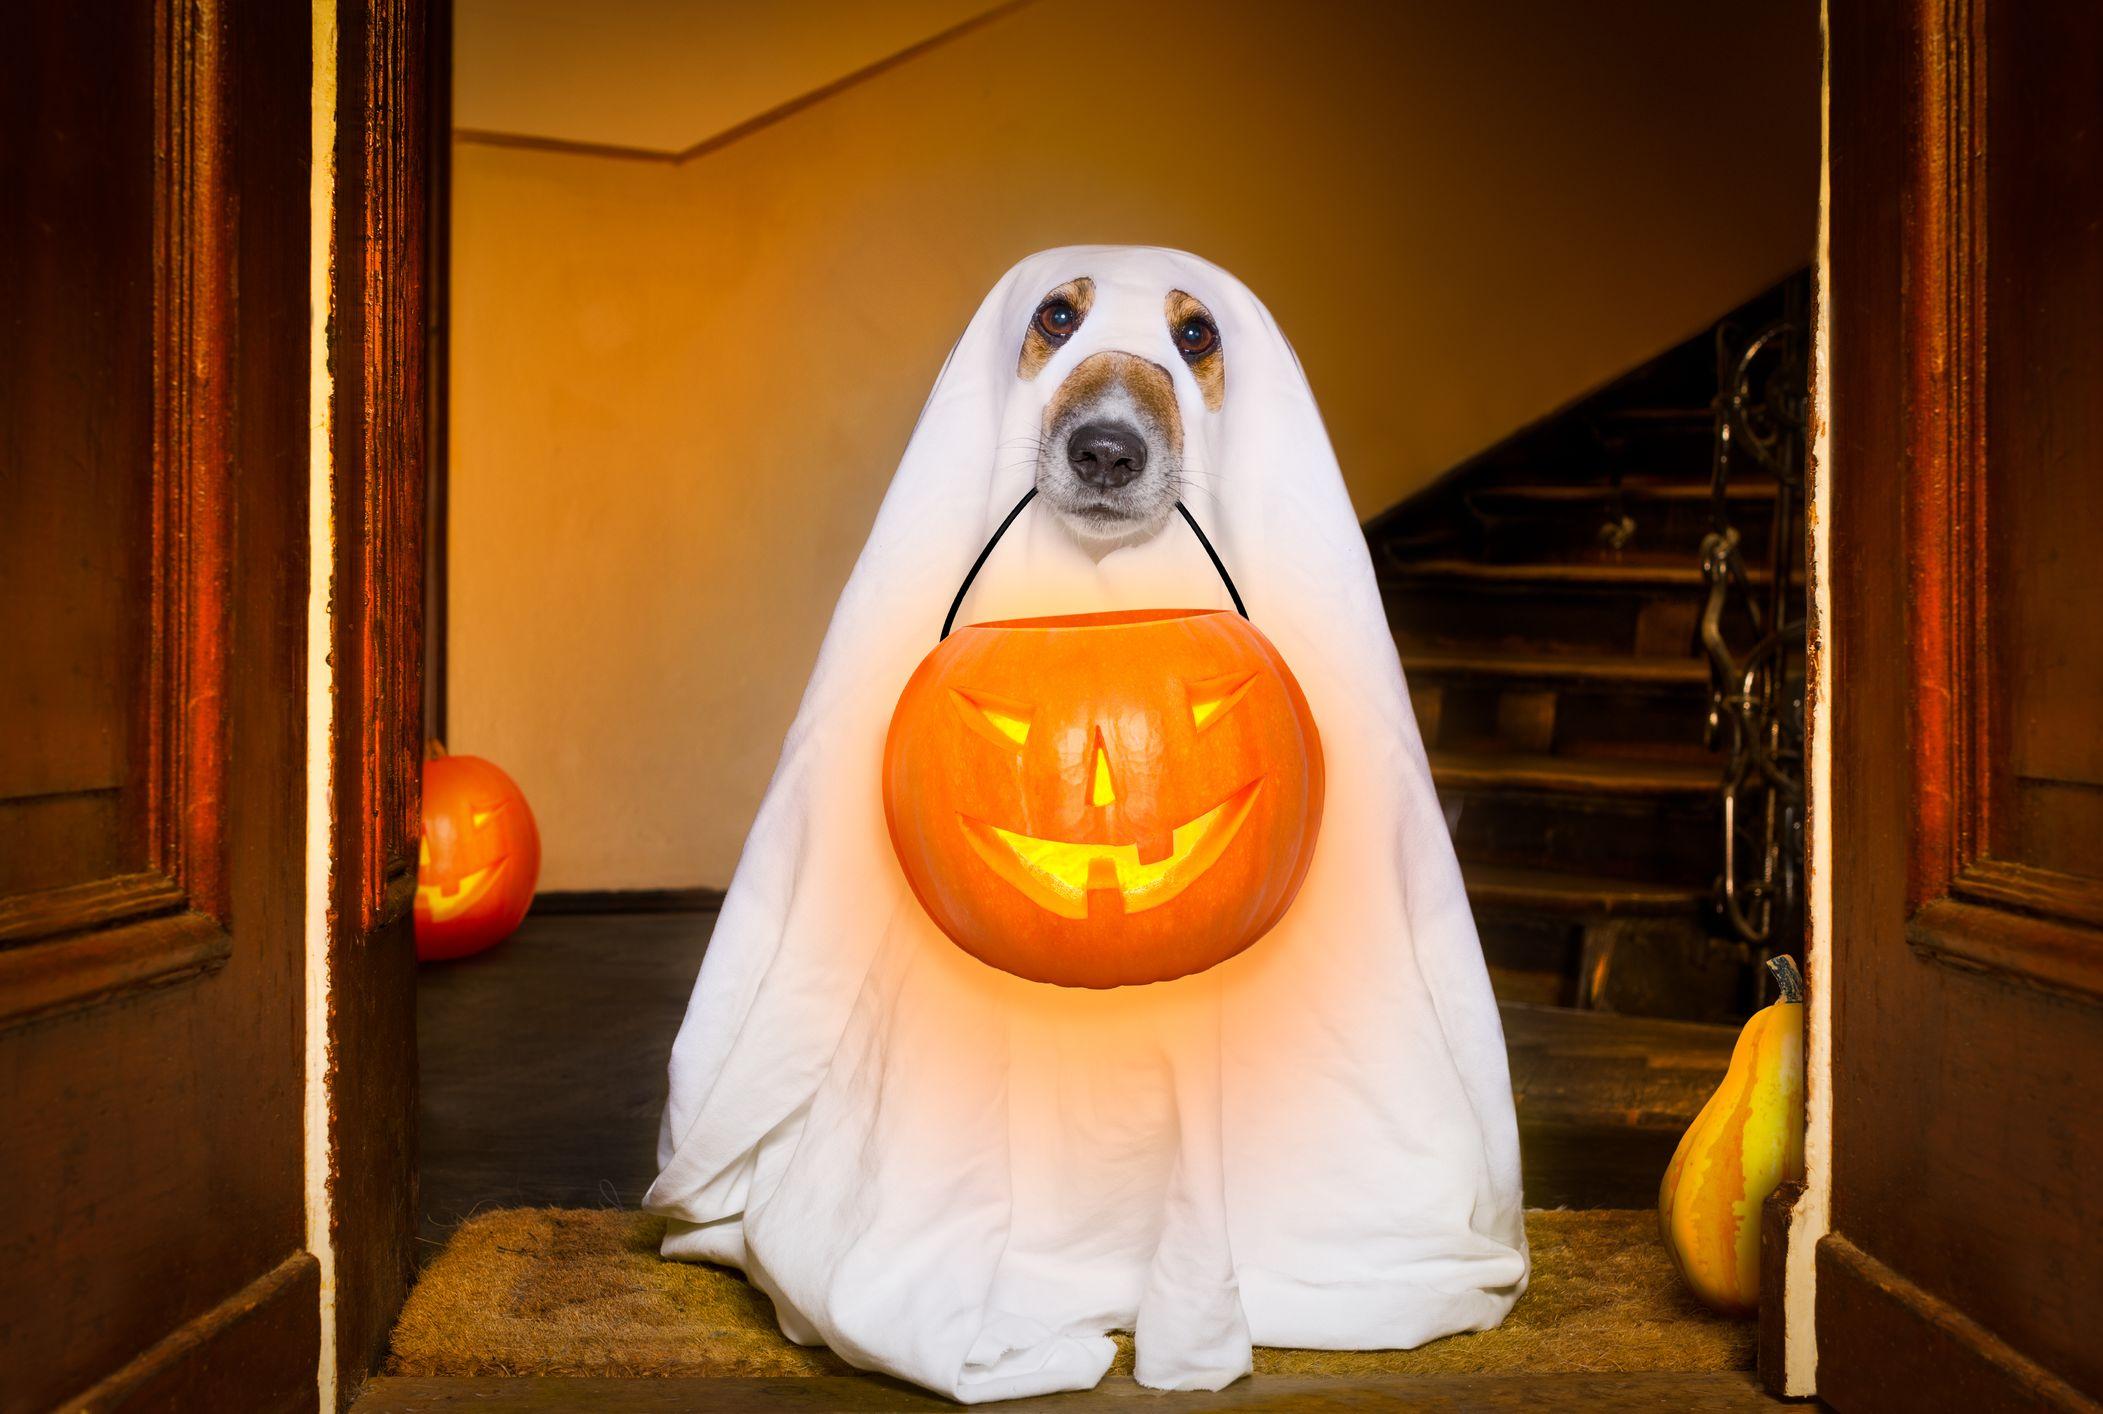 HINK Happy Halloween Party Glowing Household Children Pumpkin Decor Terror Wrist Band